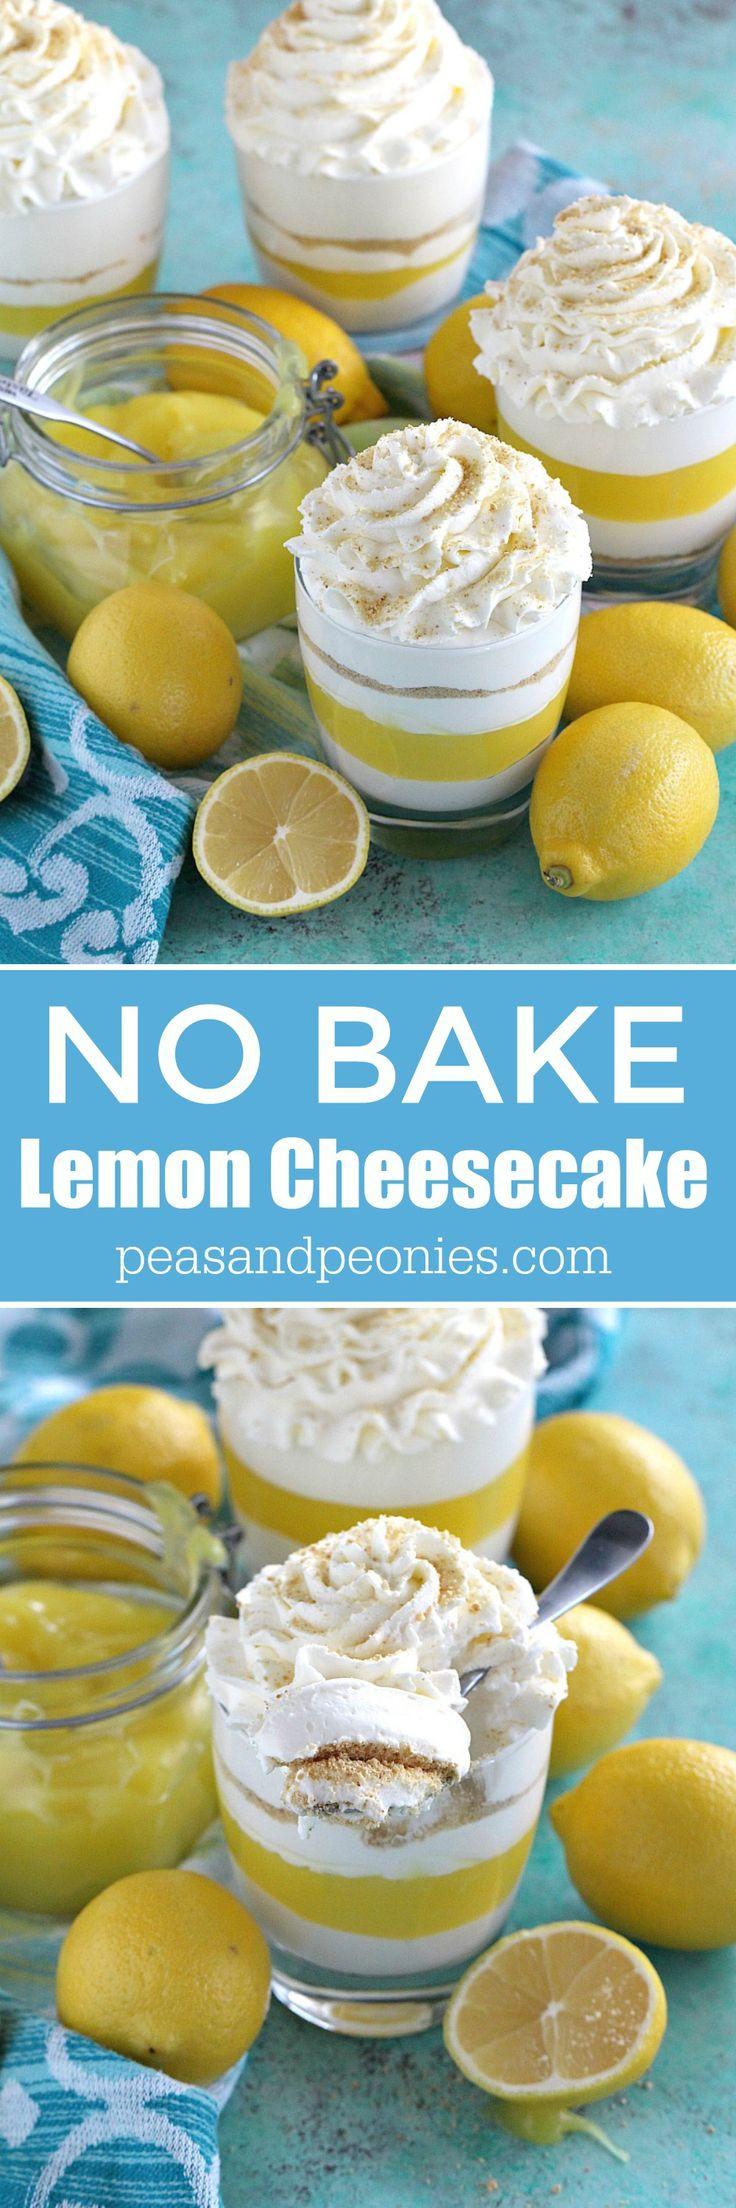 340 best Favorite Cheesecake Recipes images on Pinterest | Desert ...